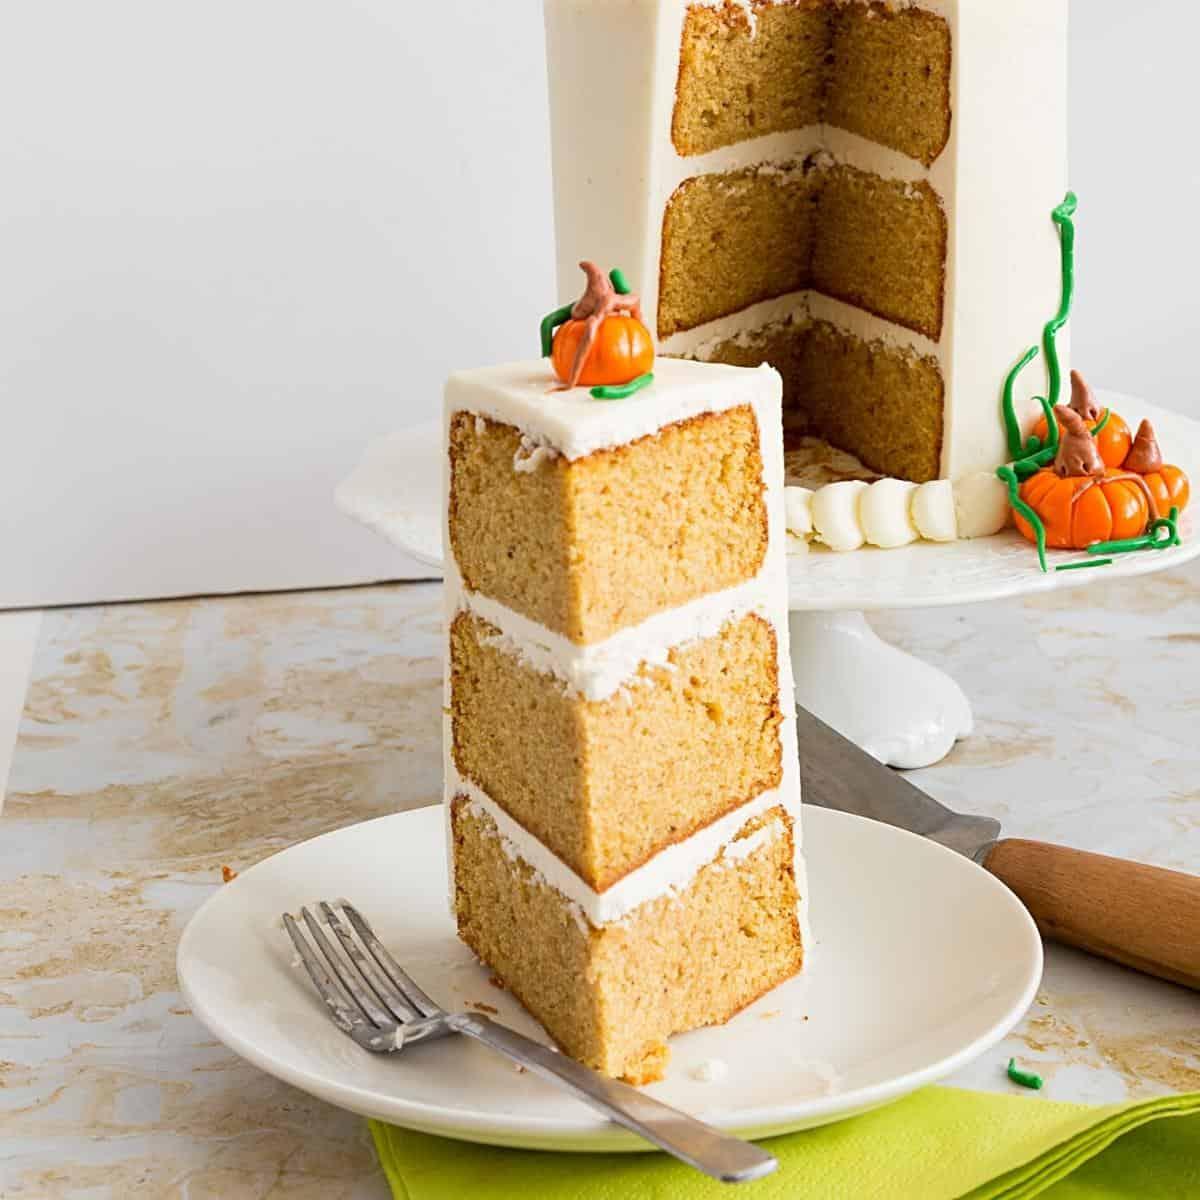 A slice of pumpkin cake.